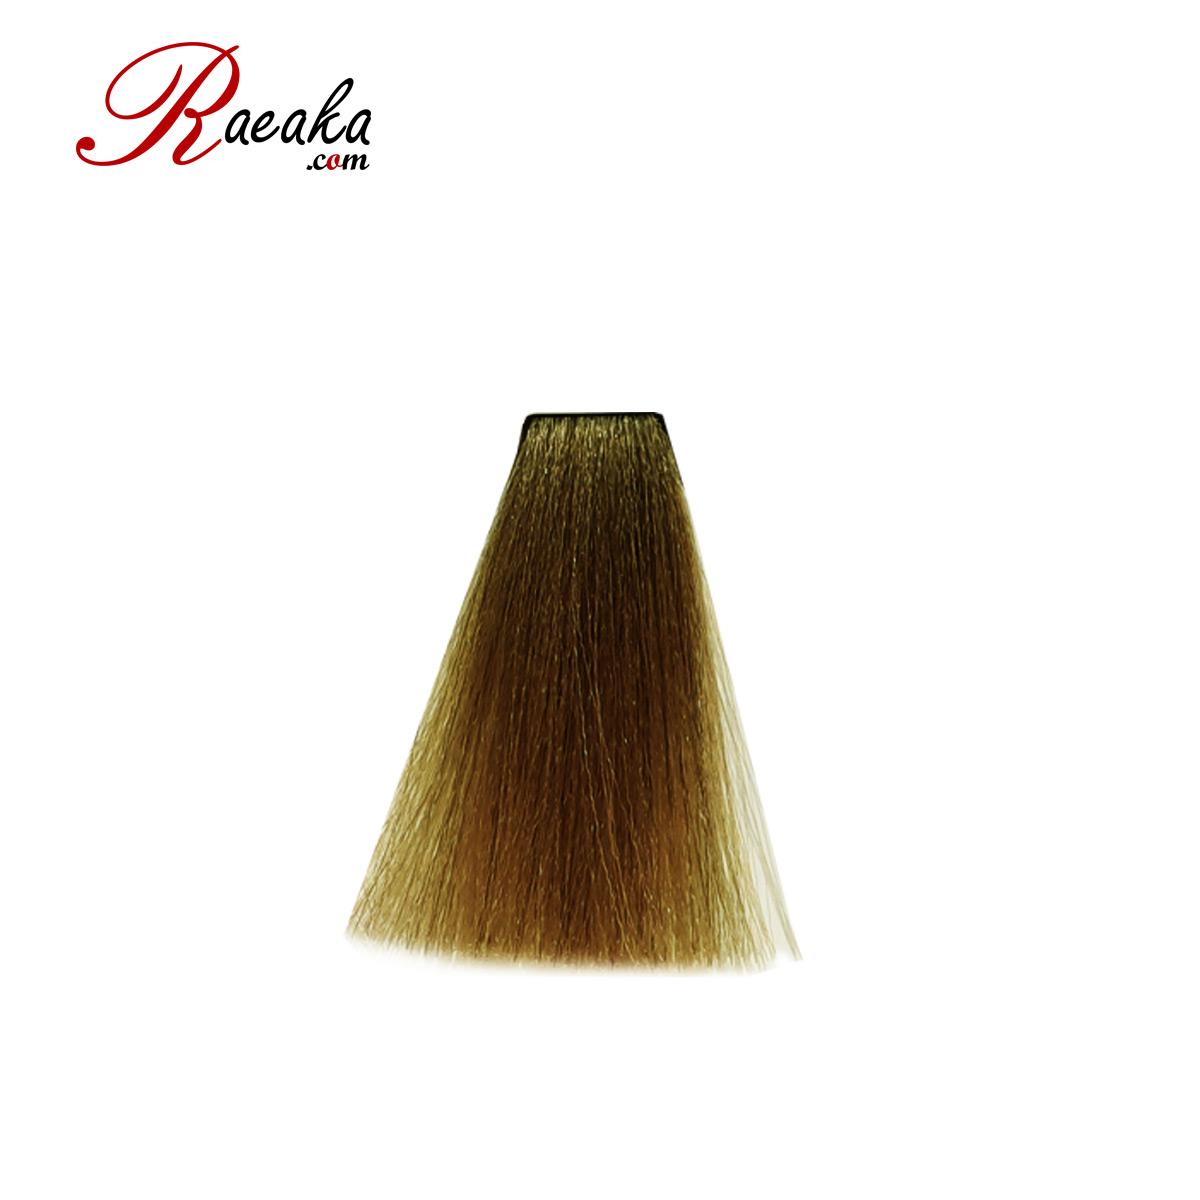 رنگ مو دوشس سری عسلی شماره 8-6 حجم 125 میلی لیتر